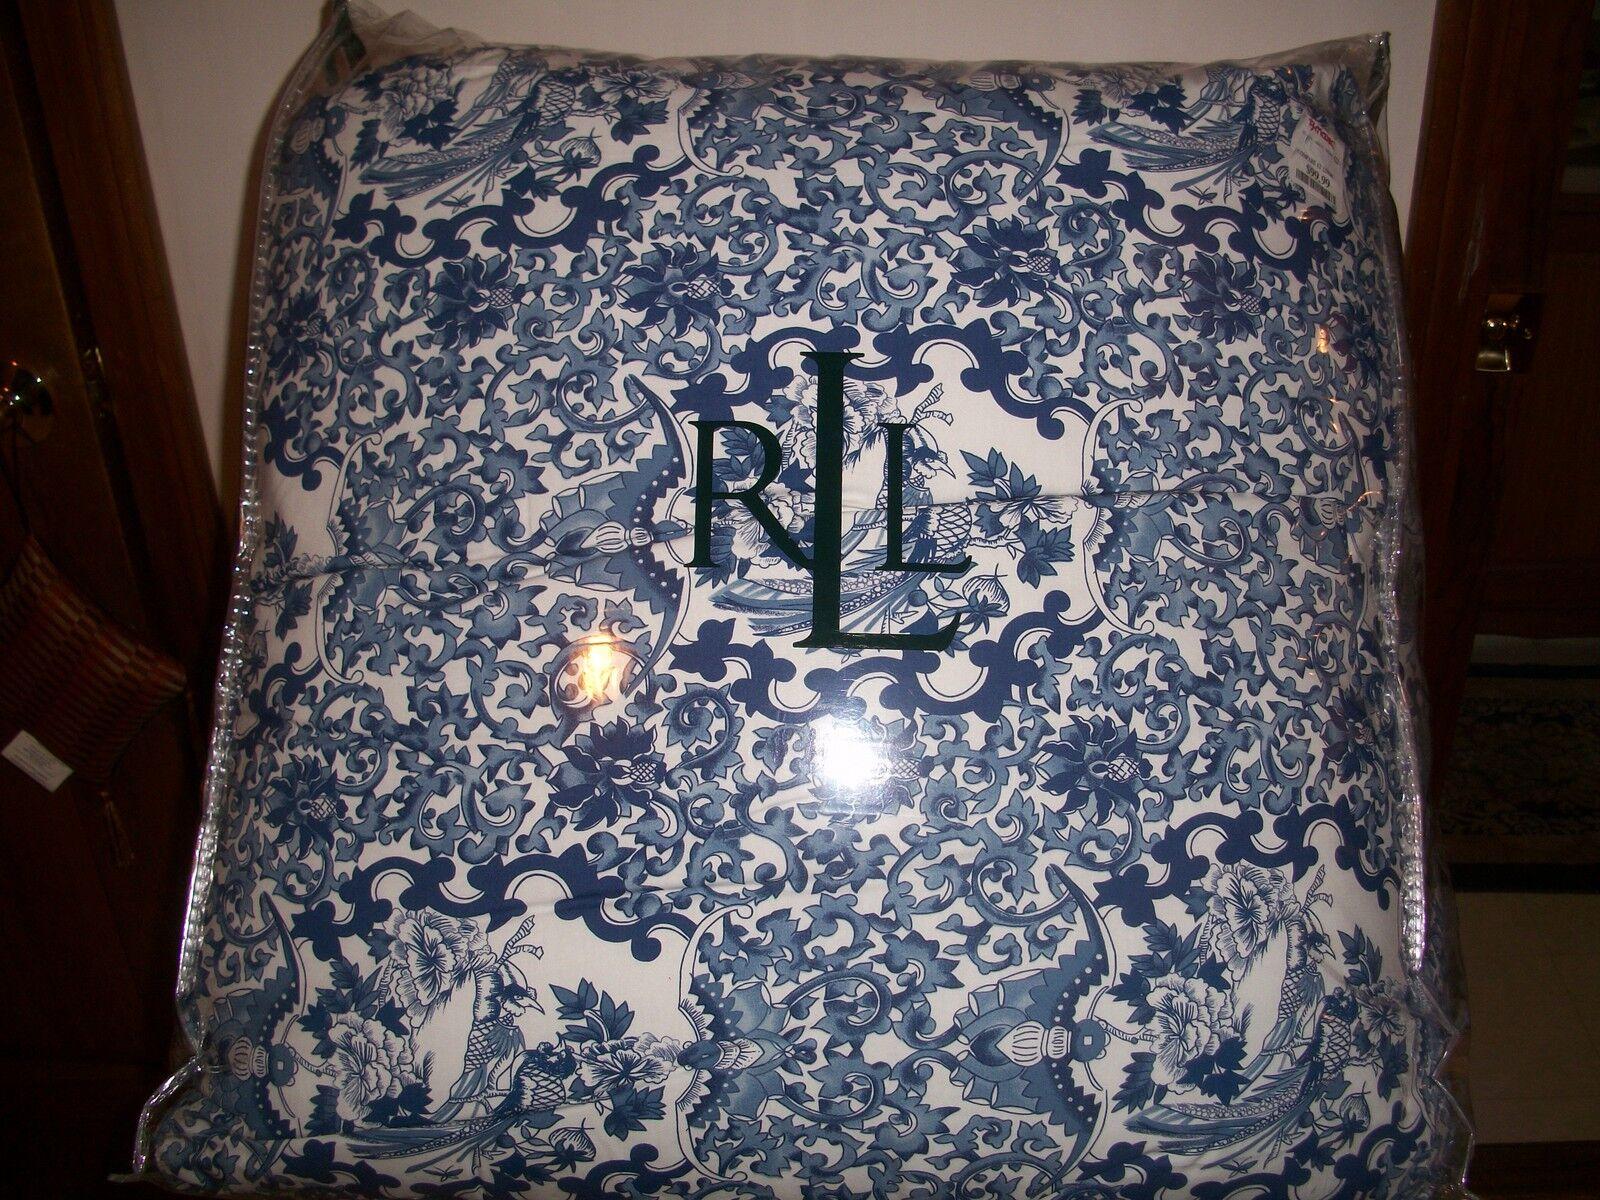 Lauren Porcelain Tamarind Bird King Quilt Toile Blue White